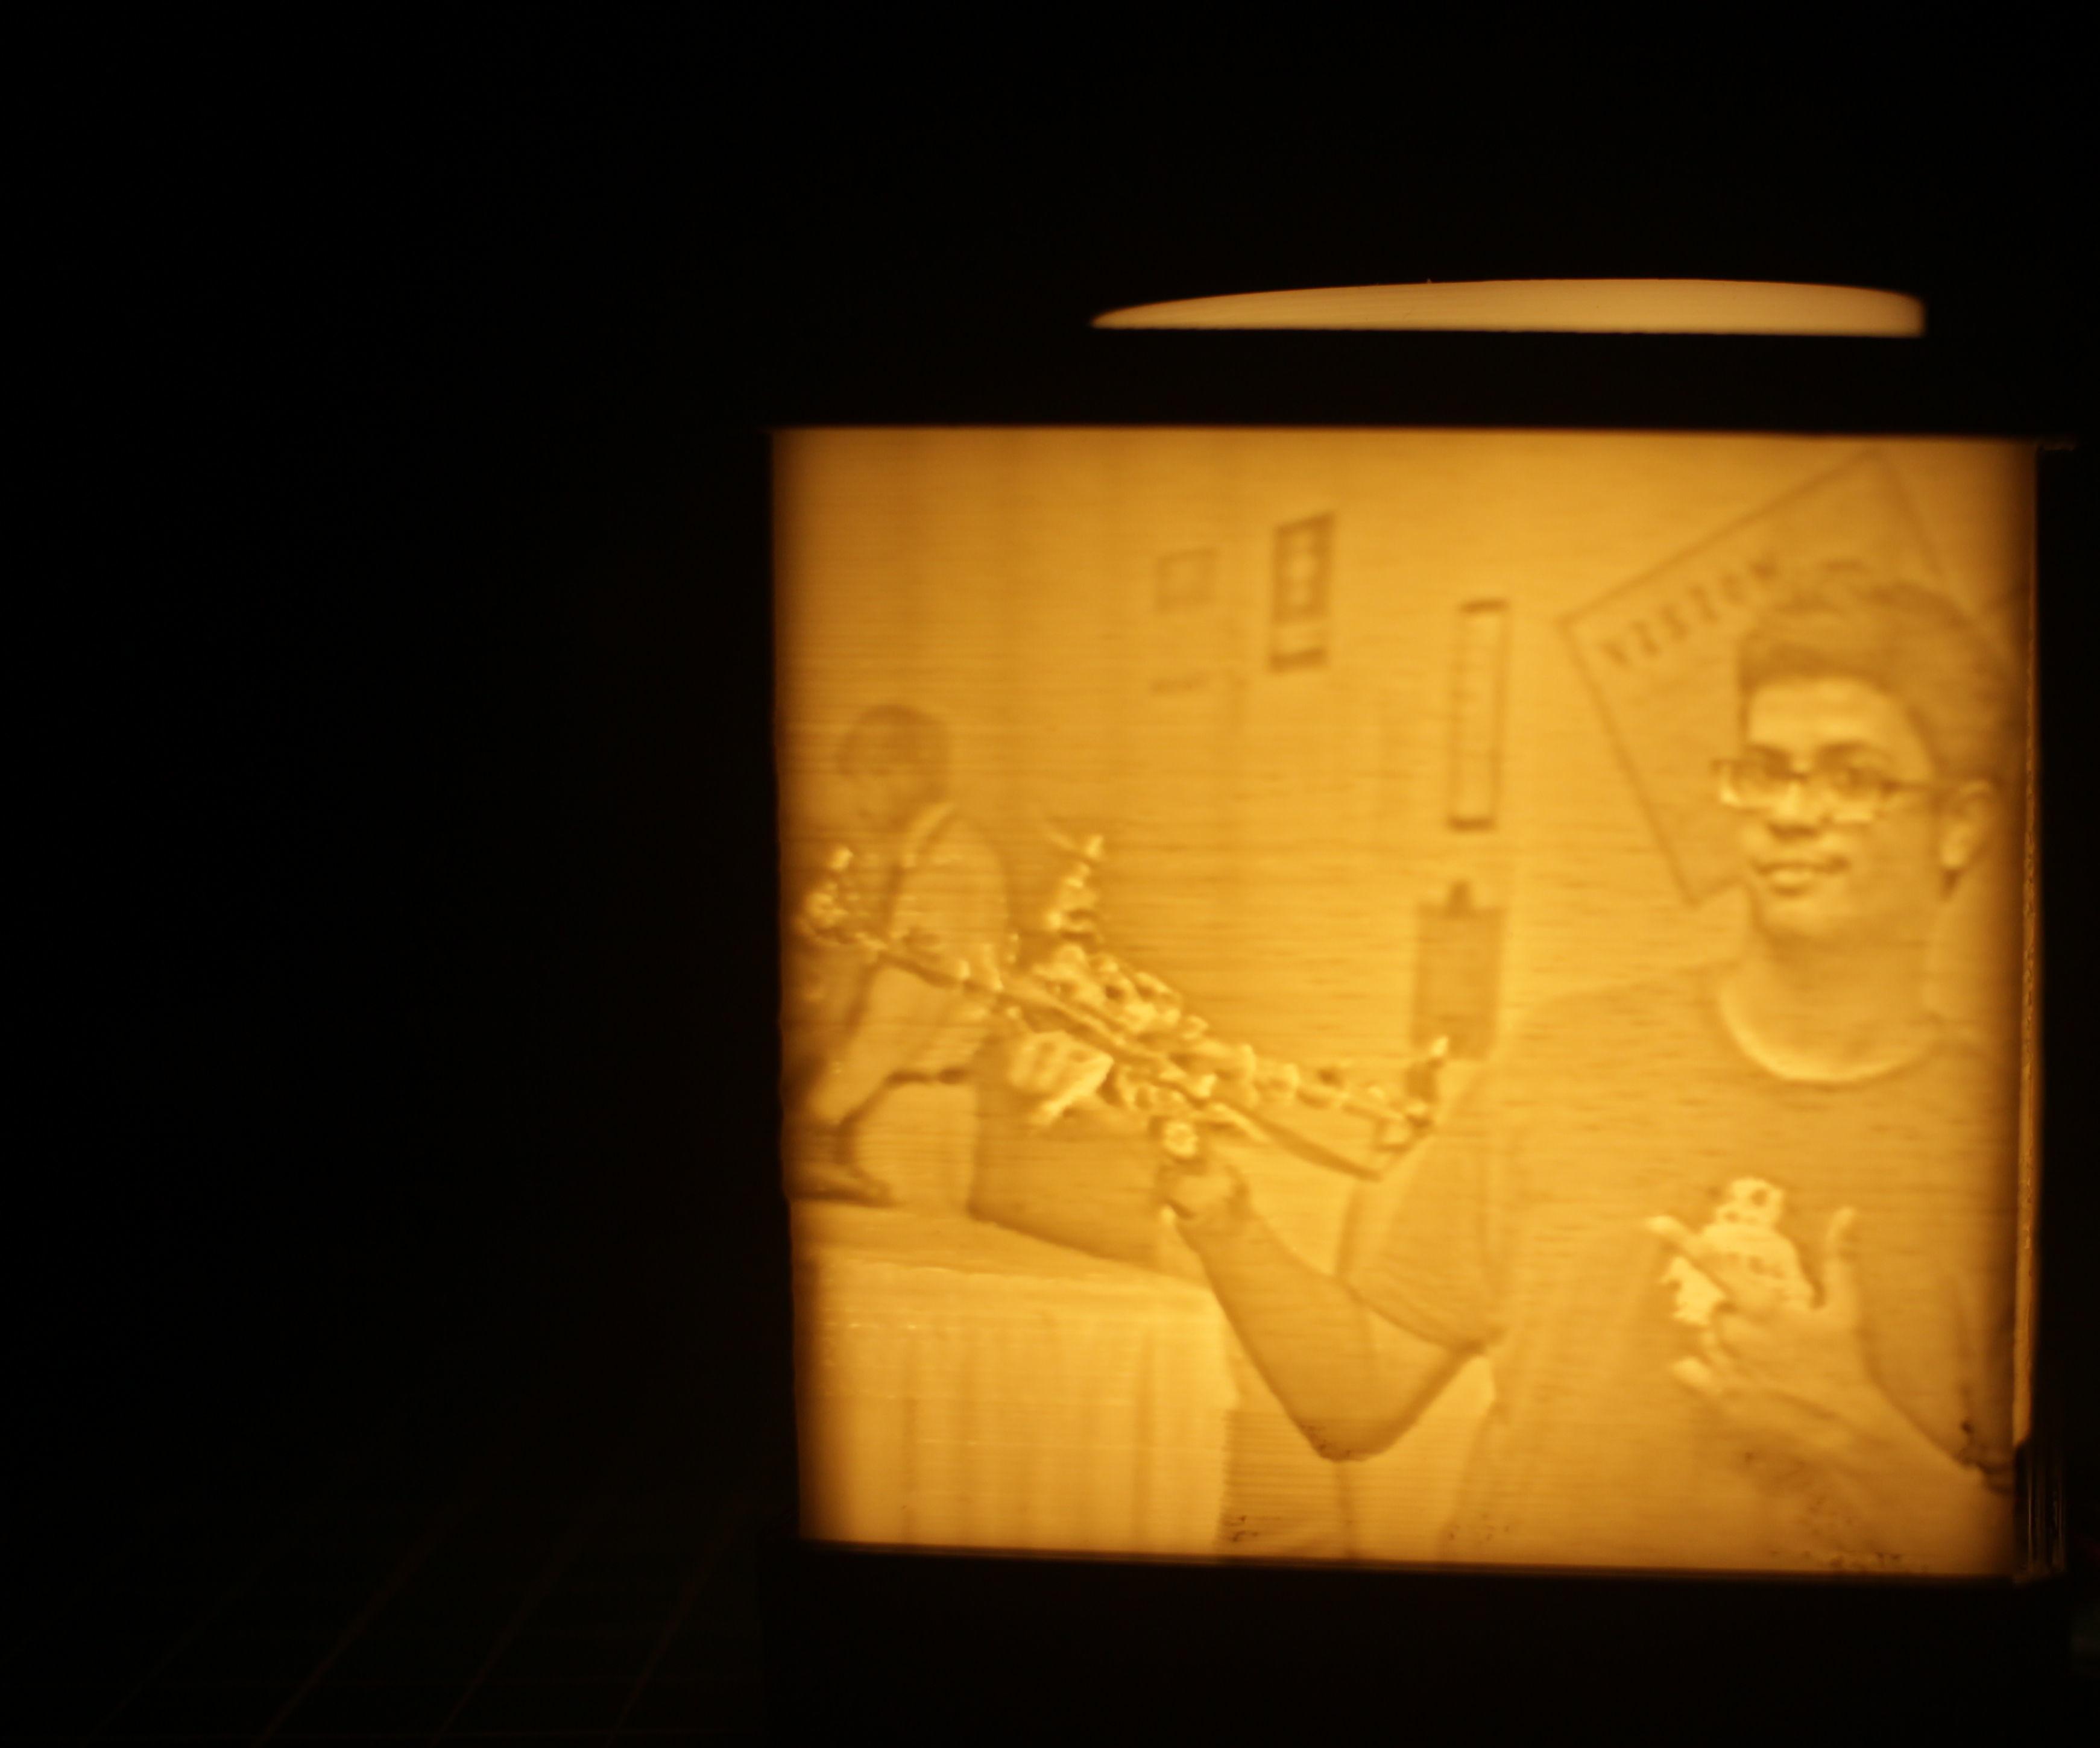 Lithophane Lamp : 3D PRINTING YOUR PHOTOS!